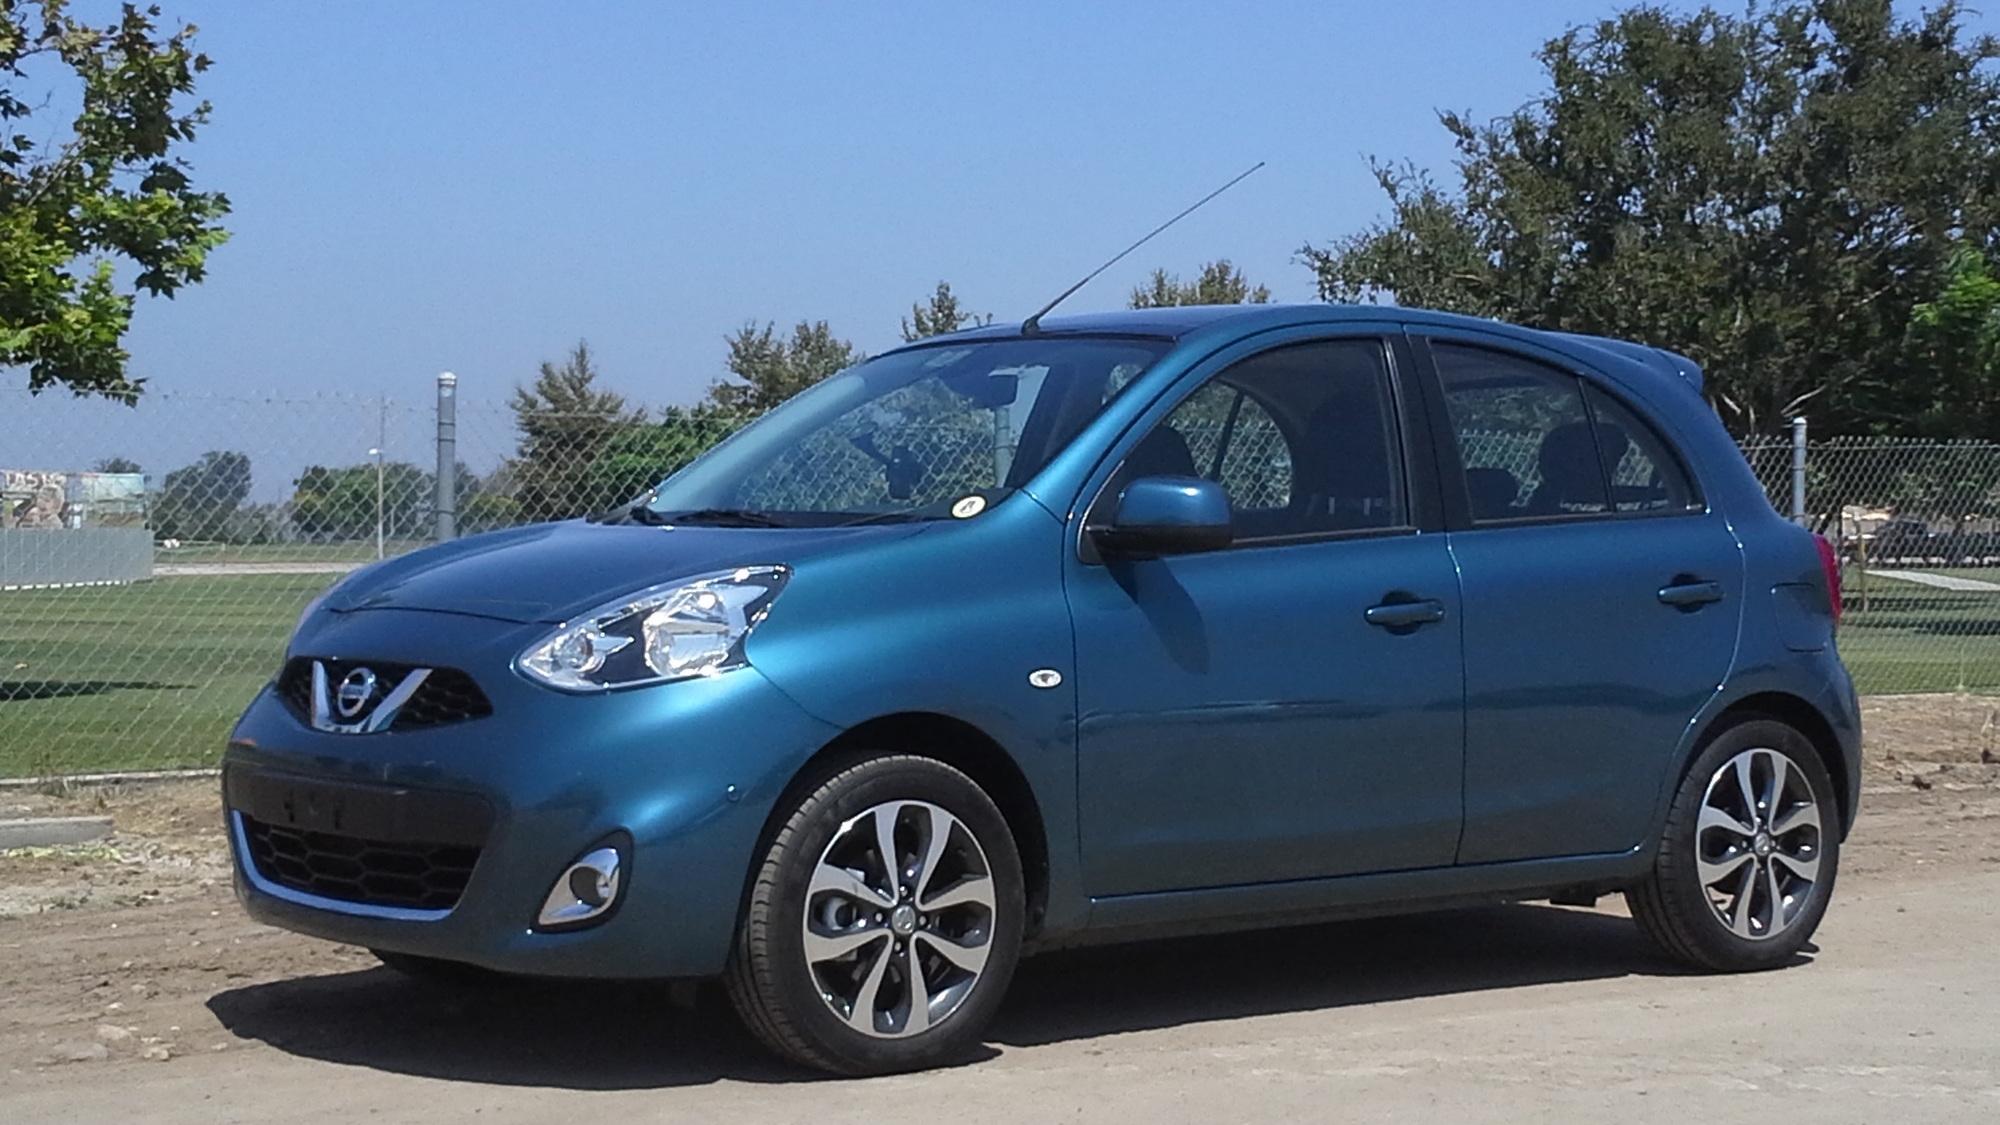 2013 Nissan Micra (European model)